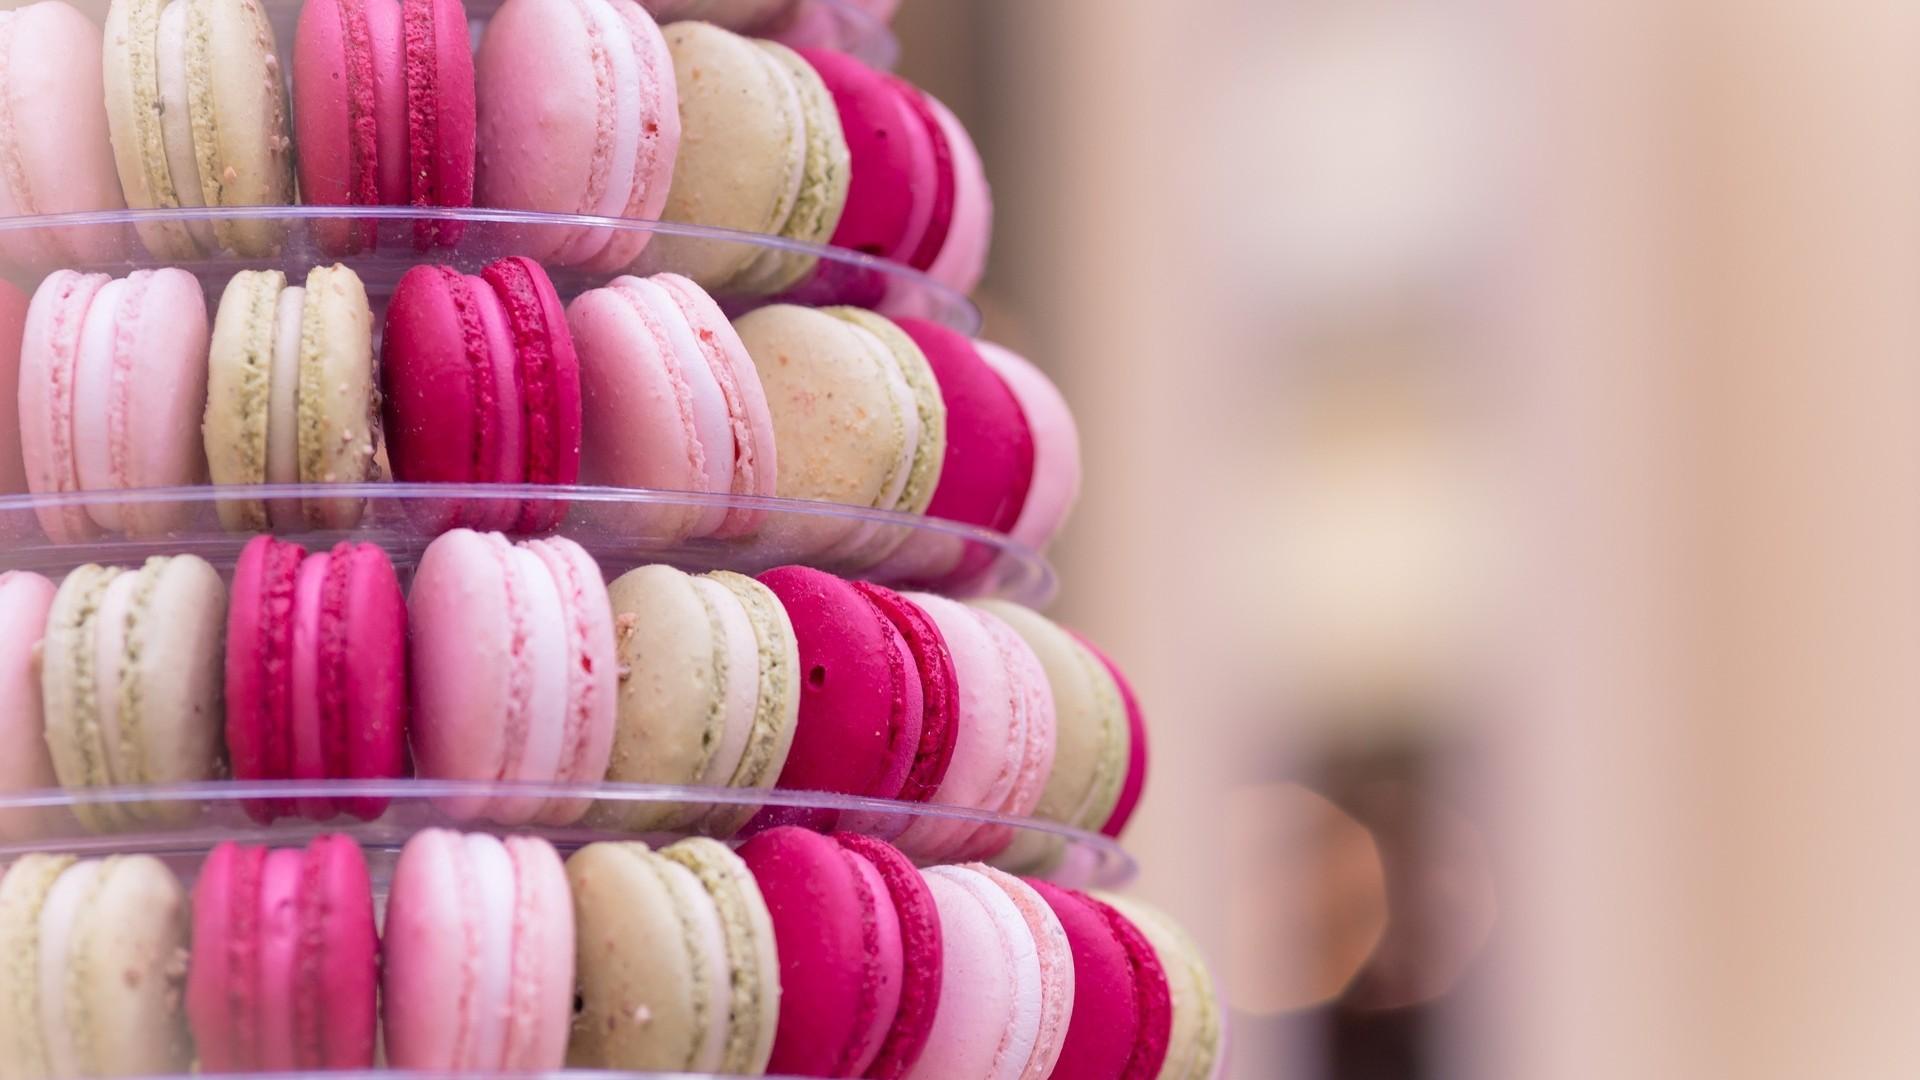 Картинки со сладостями на рабочий стол